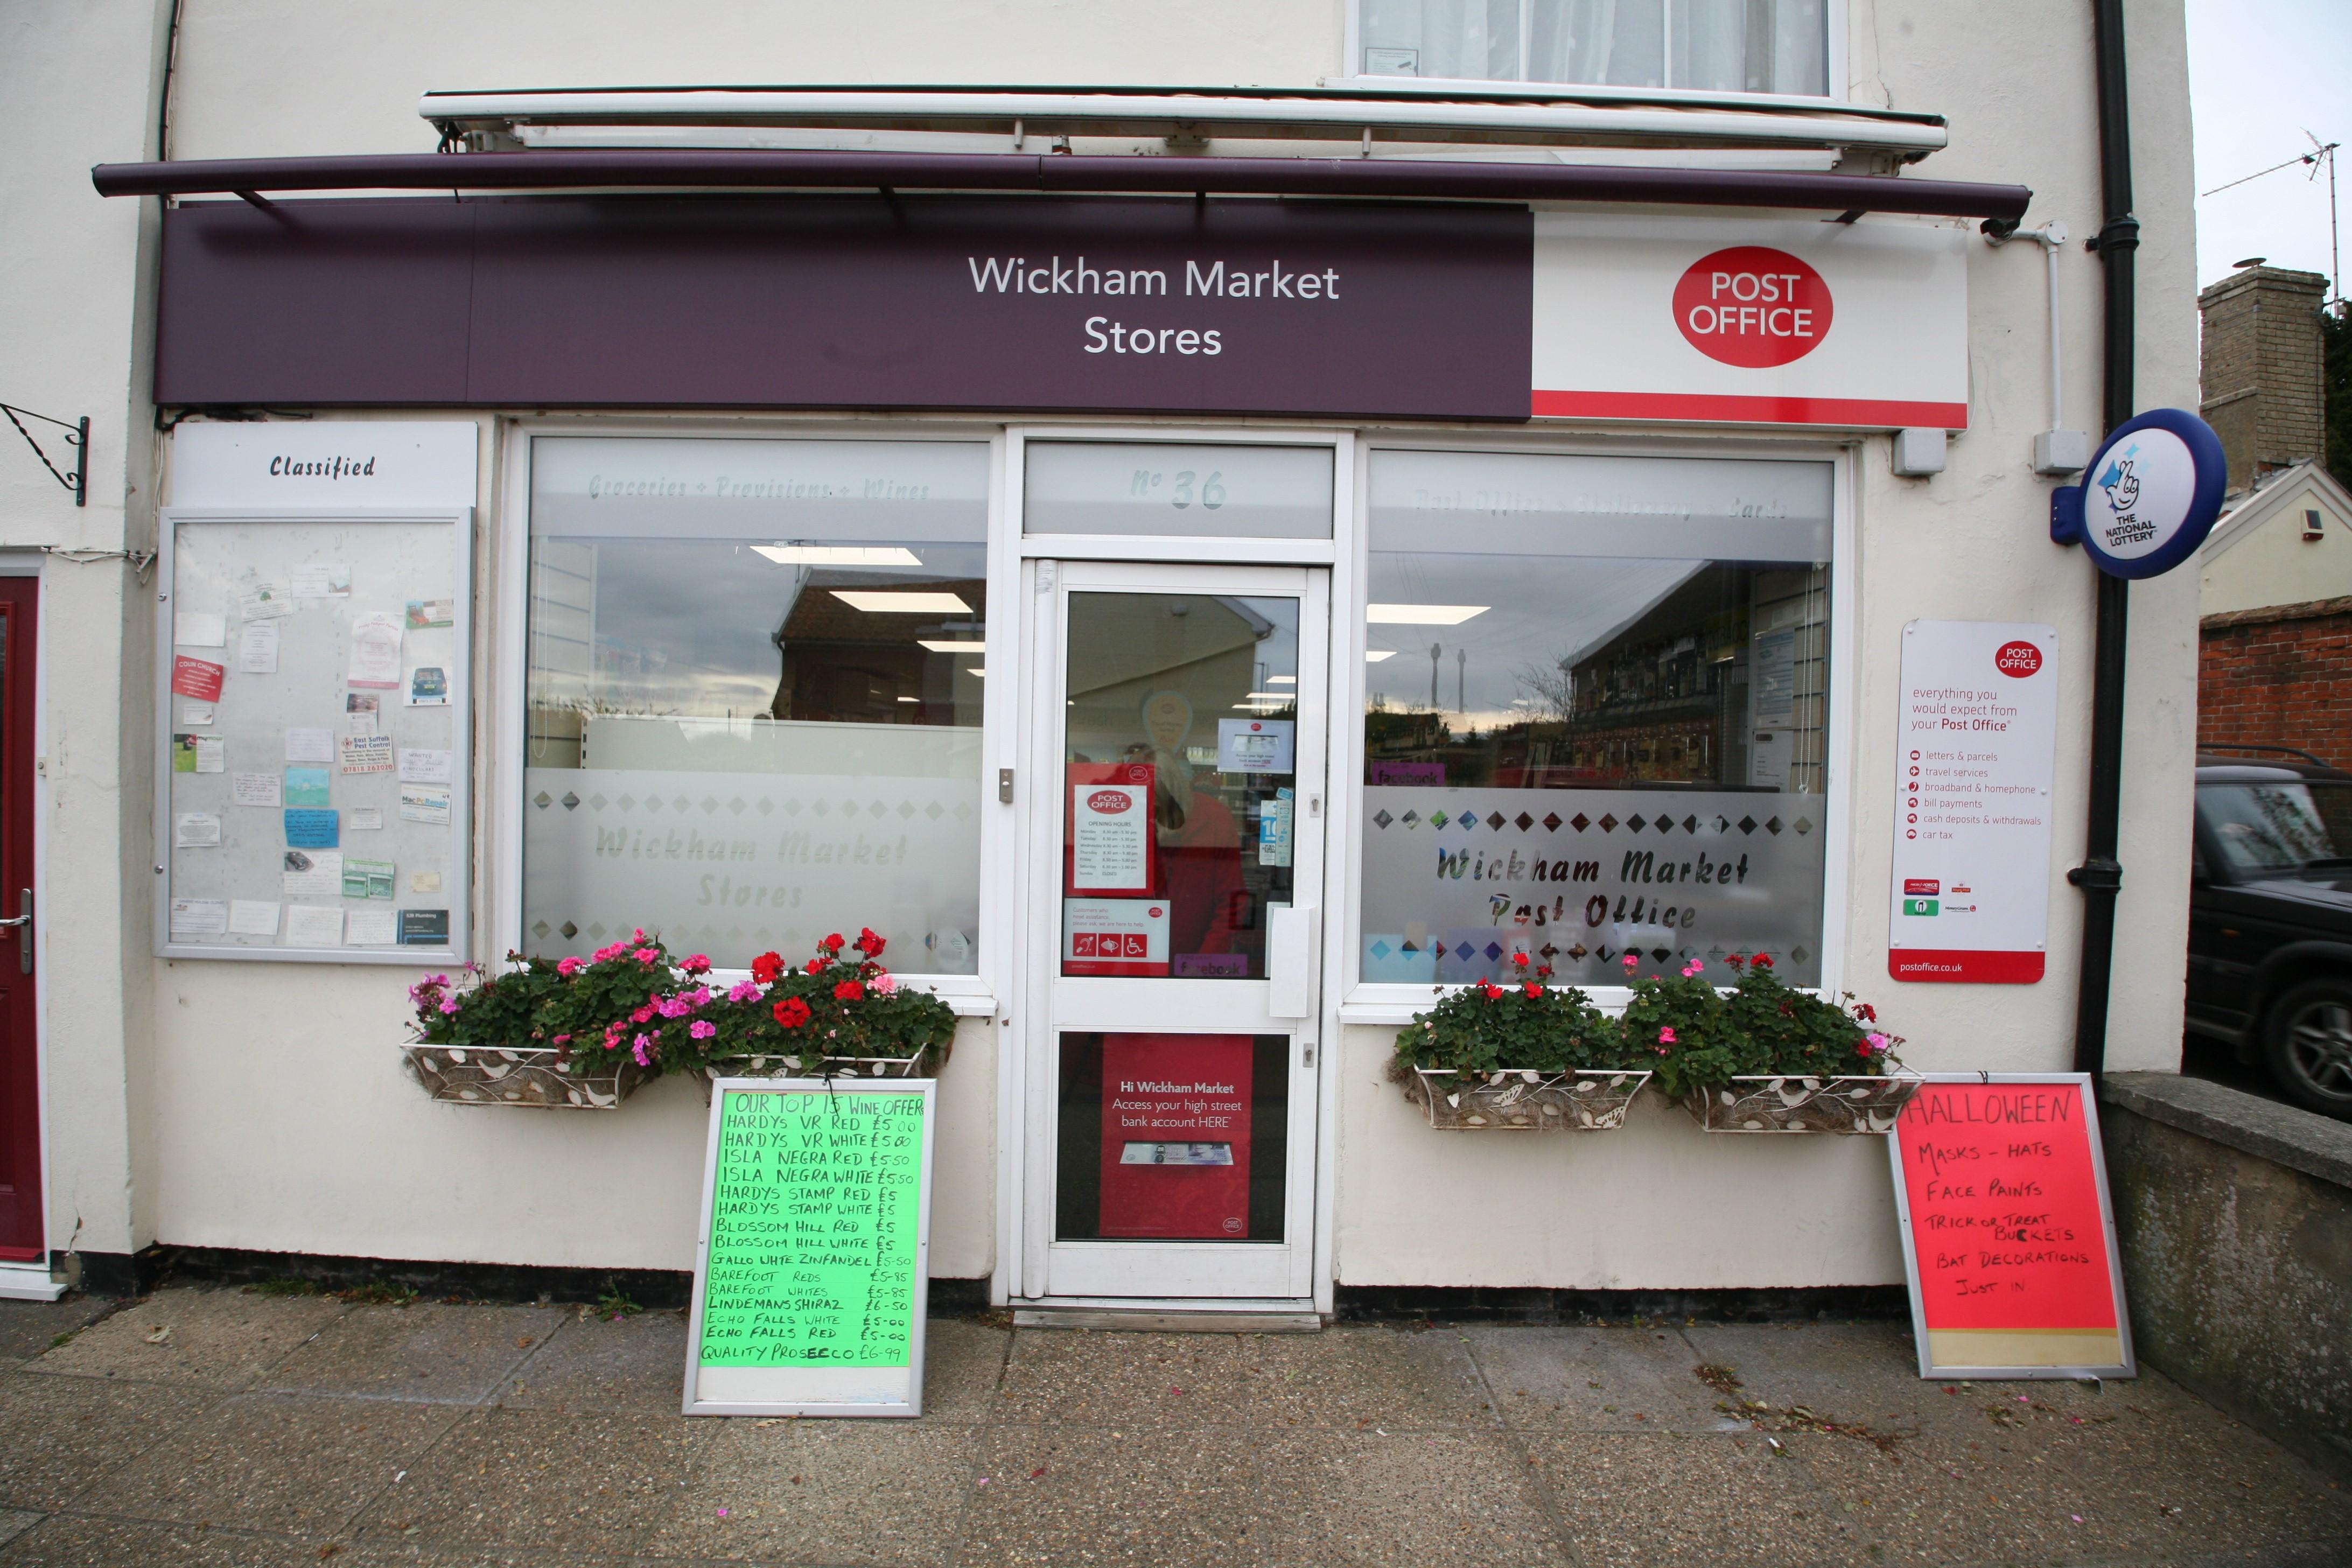 Wickham Market Stores & Post Office